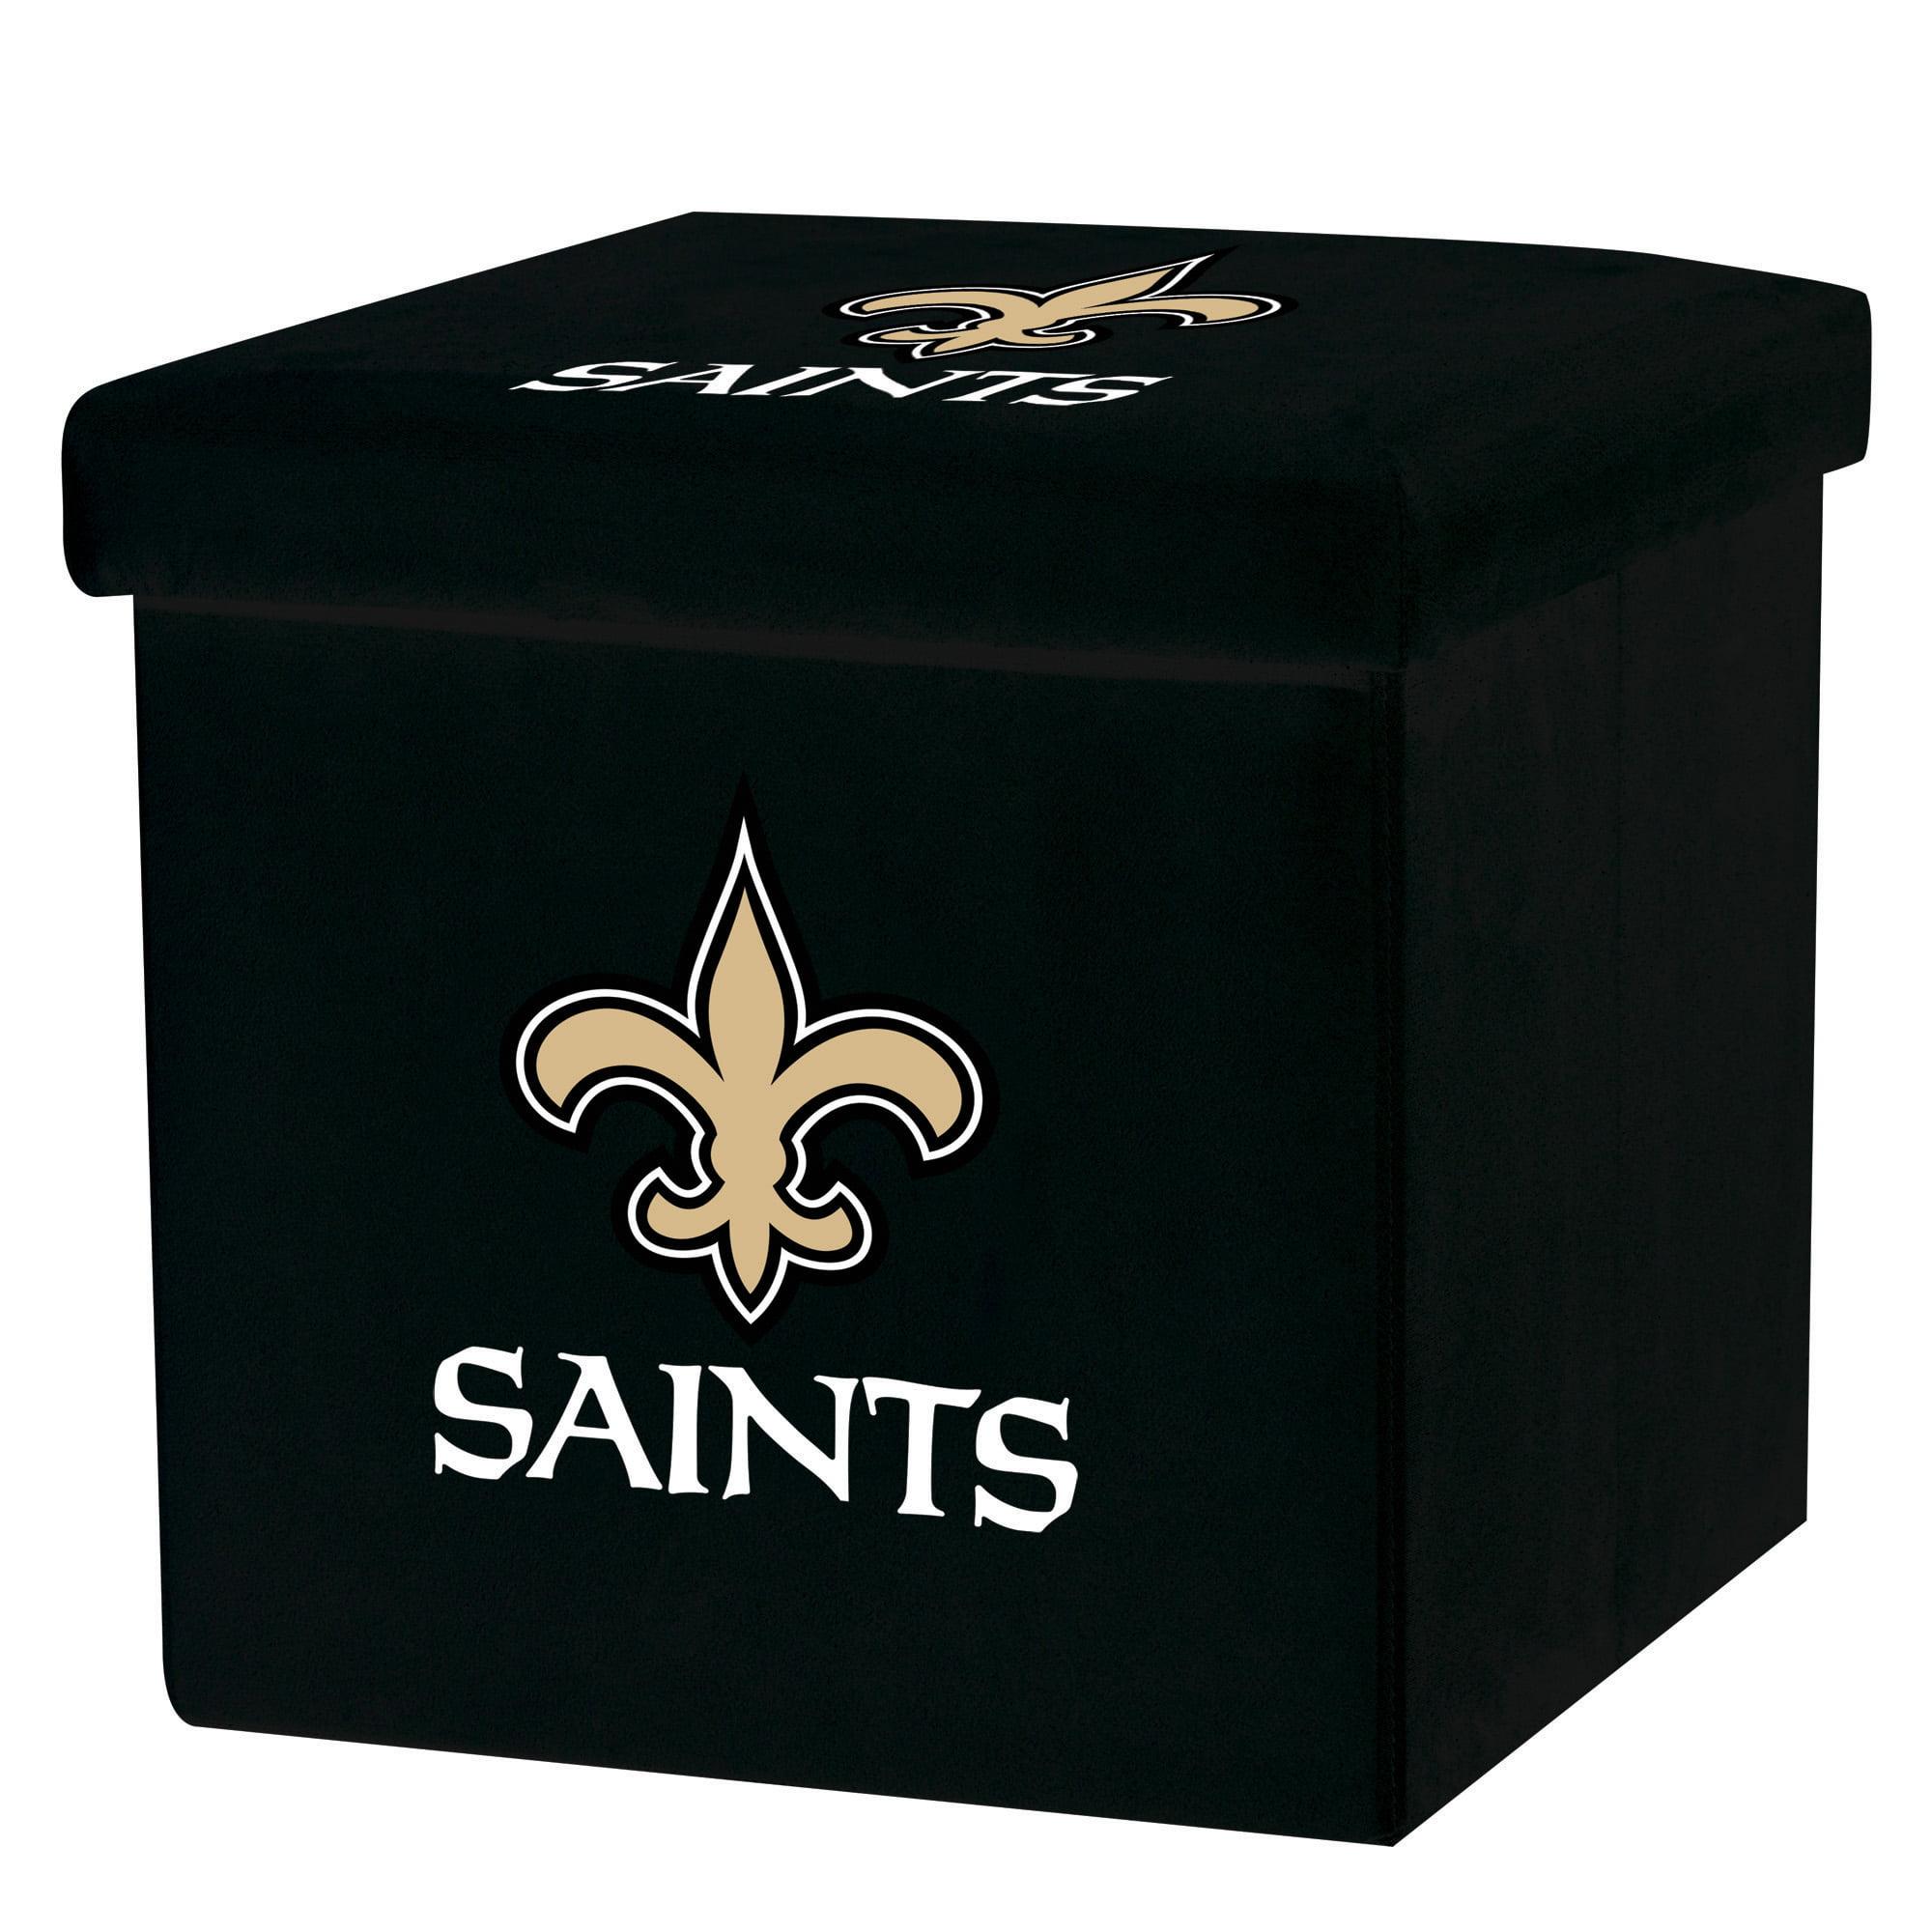 Franklin Sports NFL New Orleans Saints Storage Ottoman with Detachable Lid